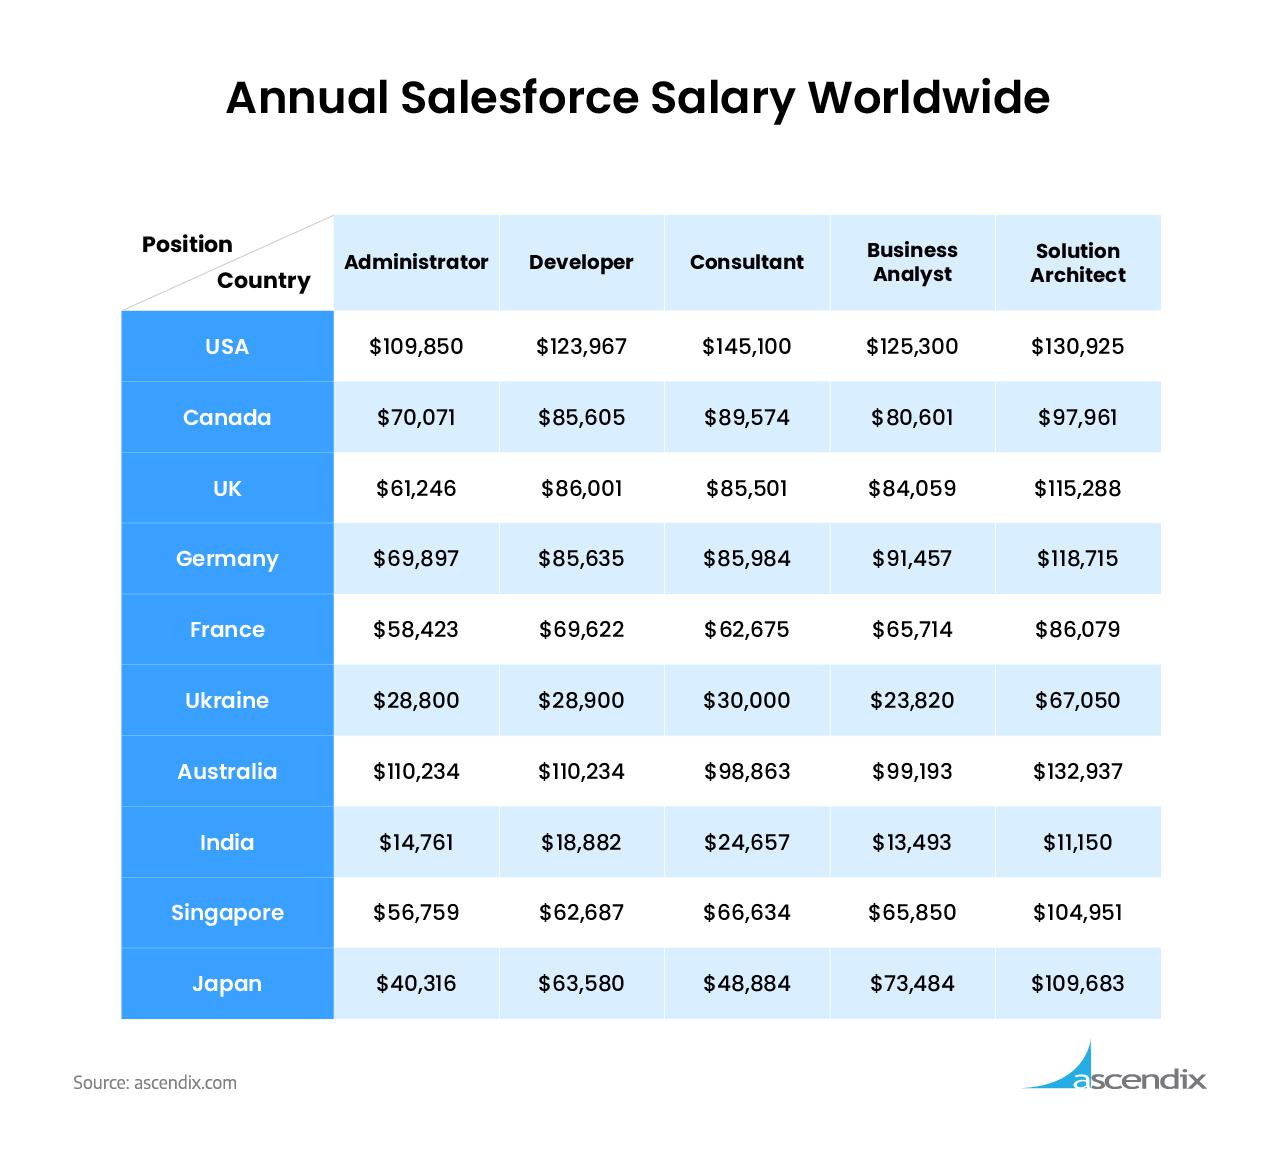 Annual Salesforce Salary Worldwide